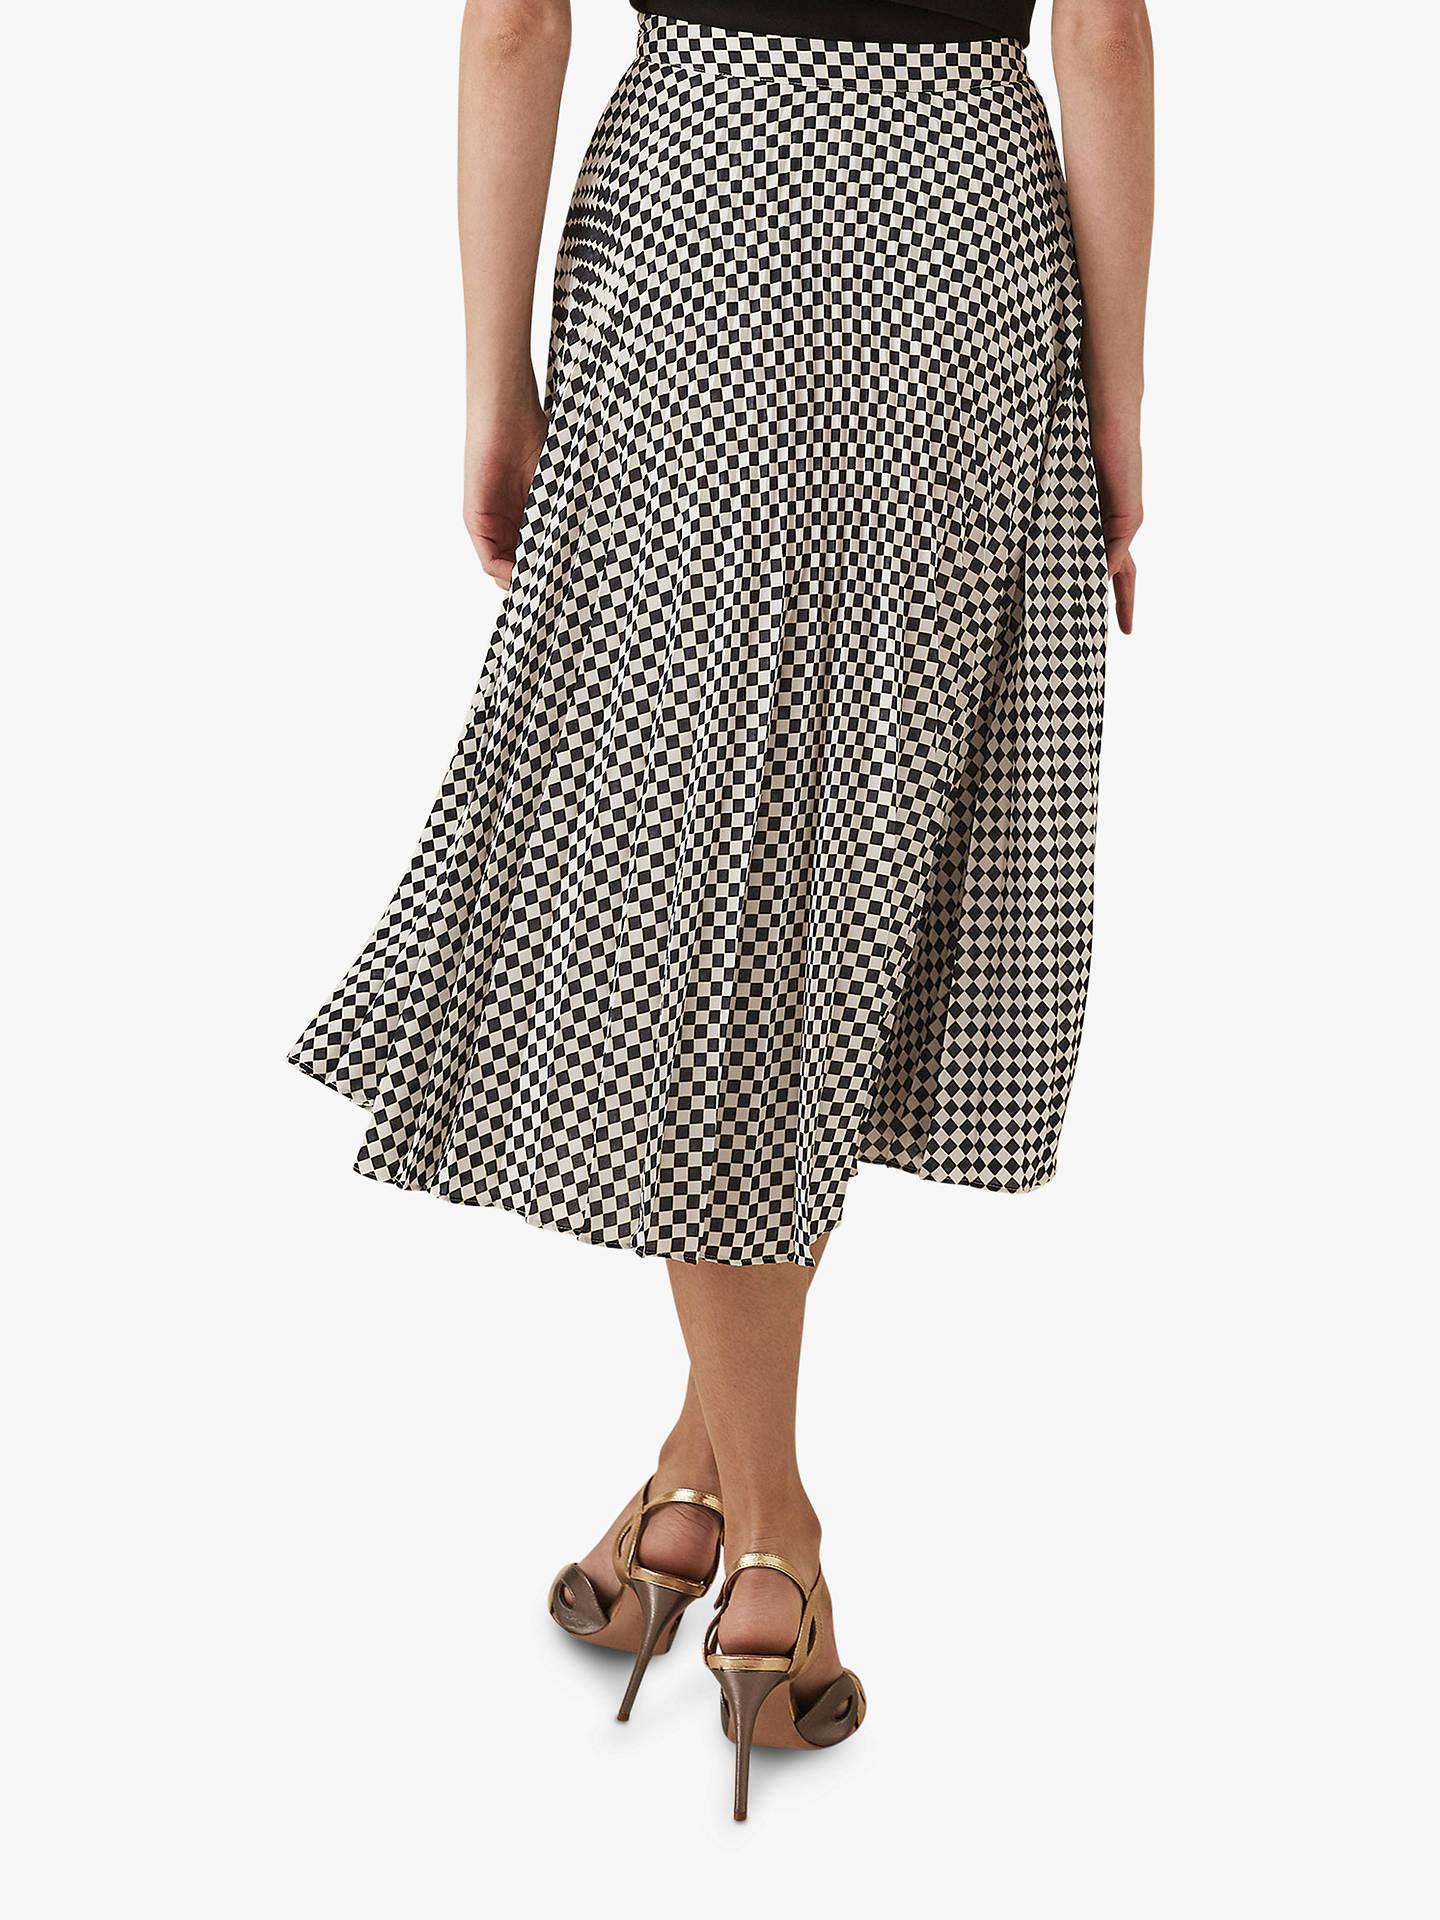 2b280f0c6 Buy Reiss Abigale Check Pleat Skirt, Black/White, 6 Online at johnlewis.